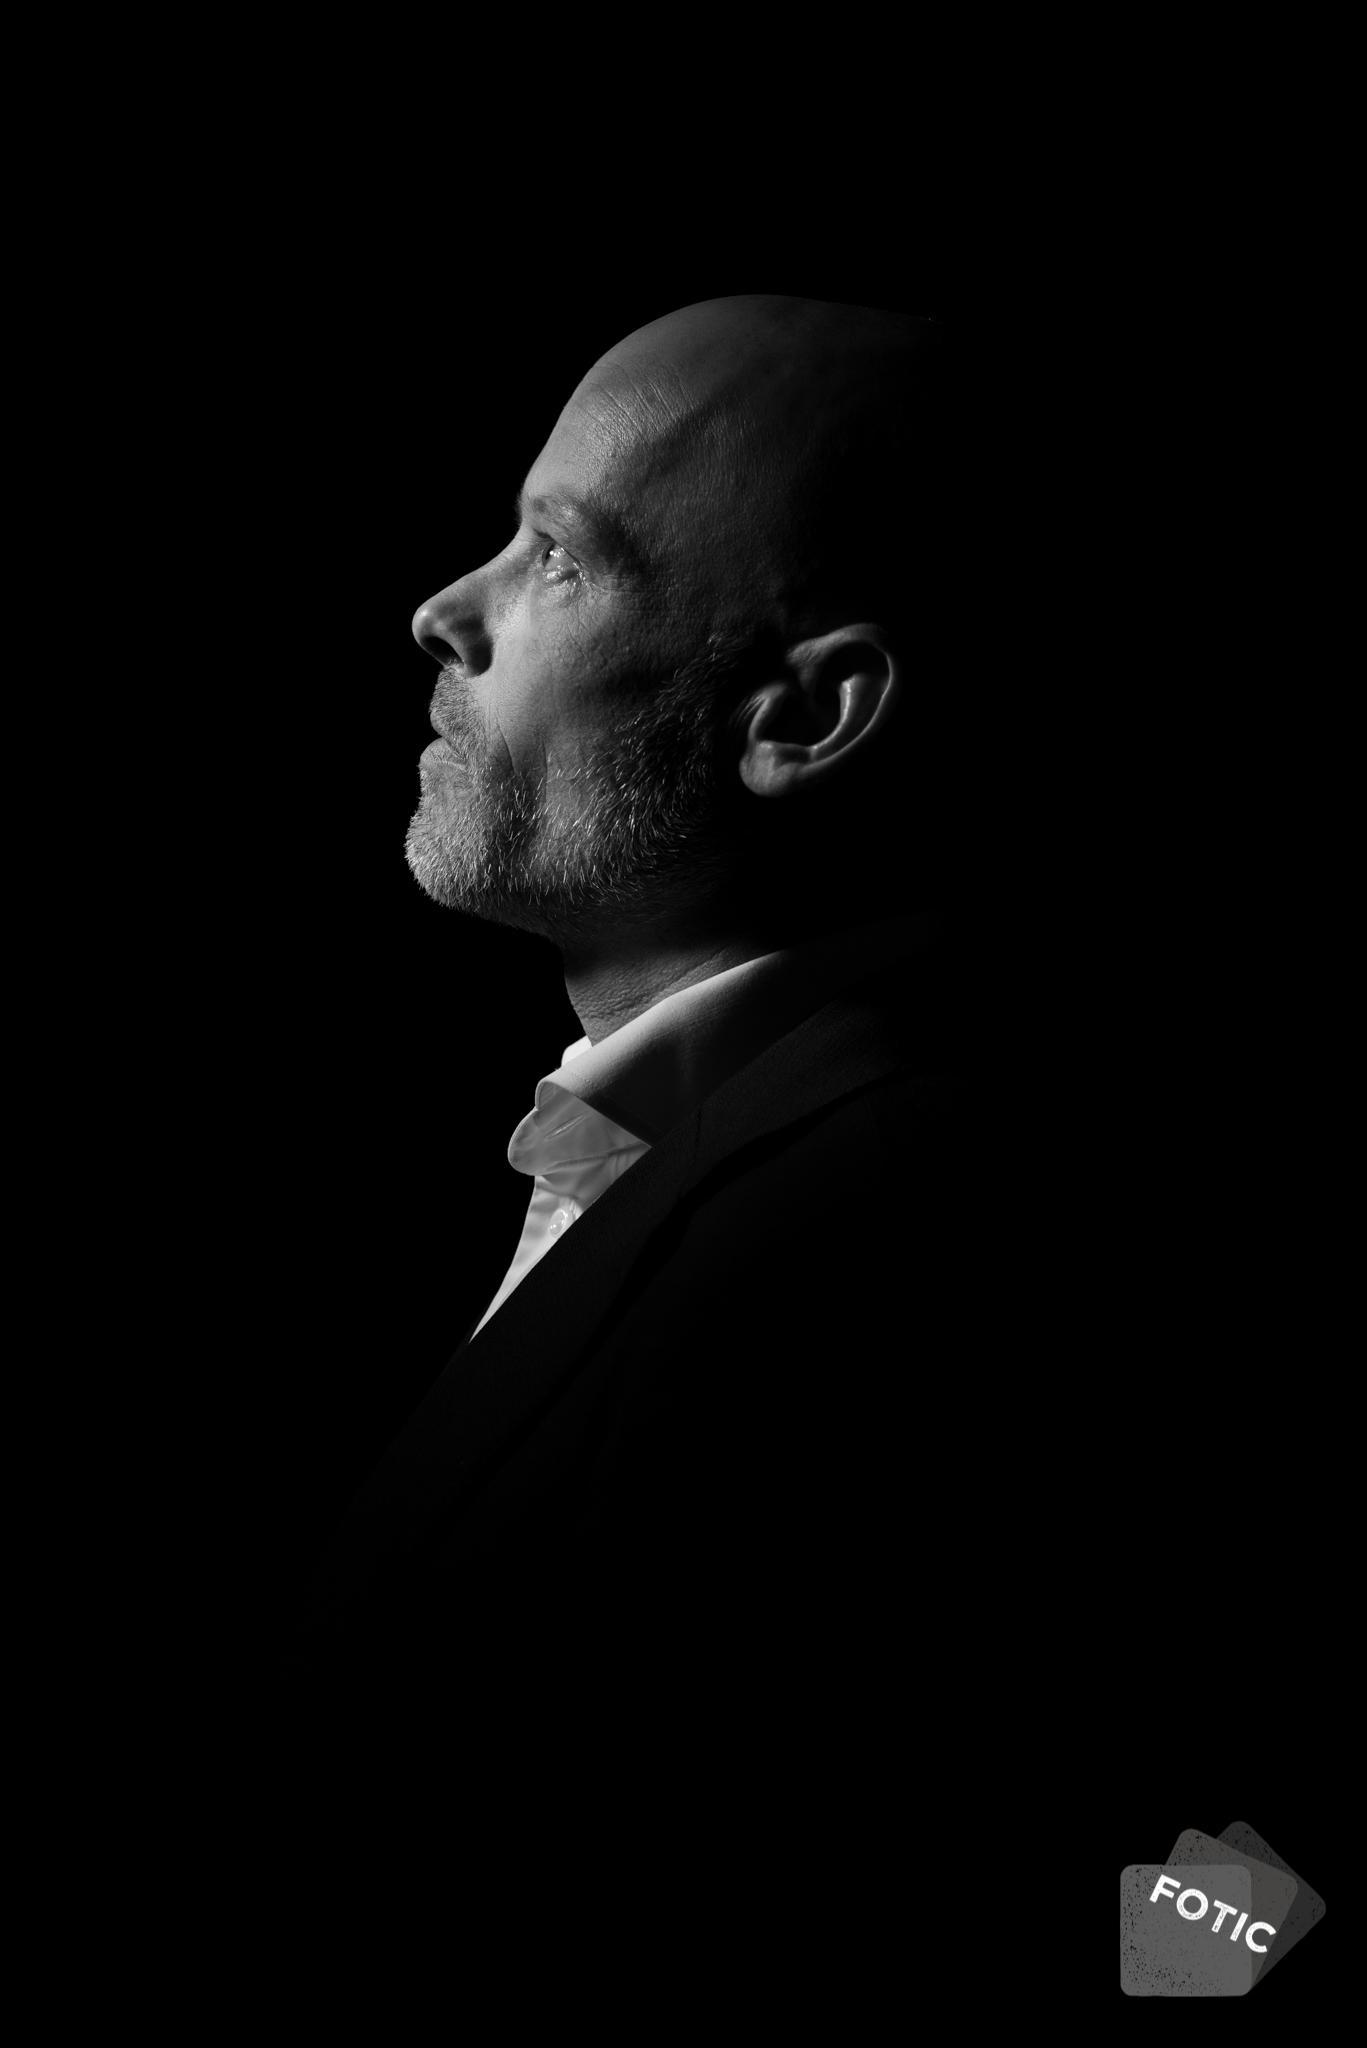 portretfoto Pjotr Hoogers zwartwit